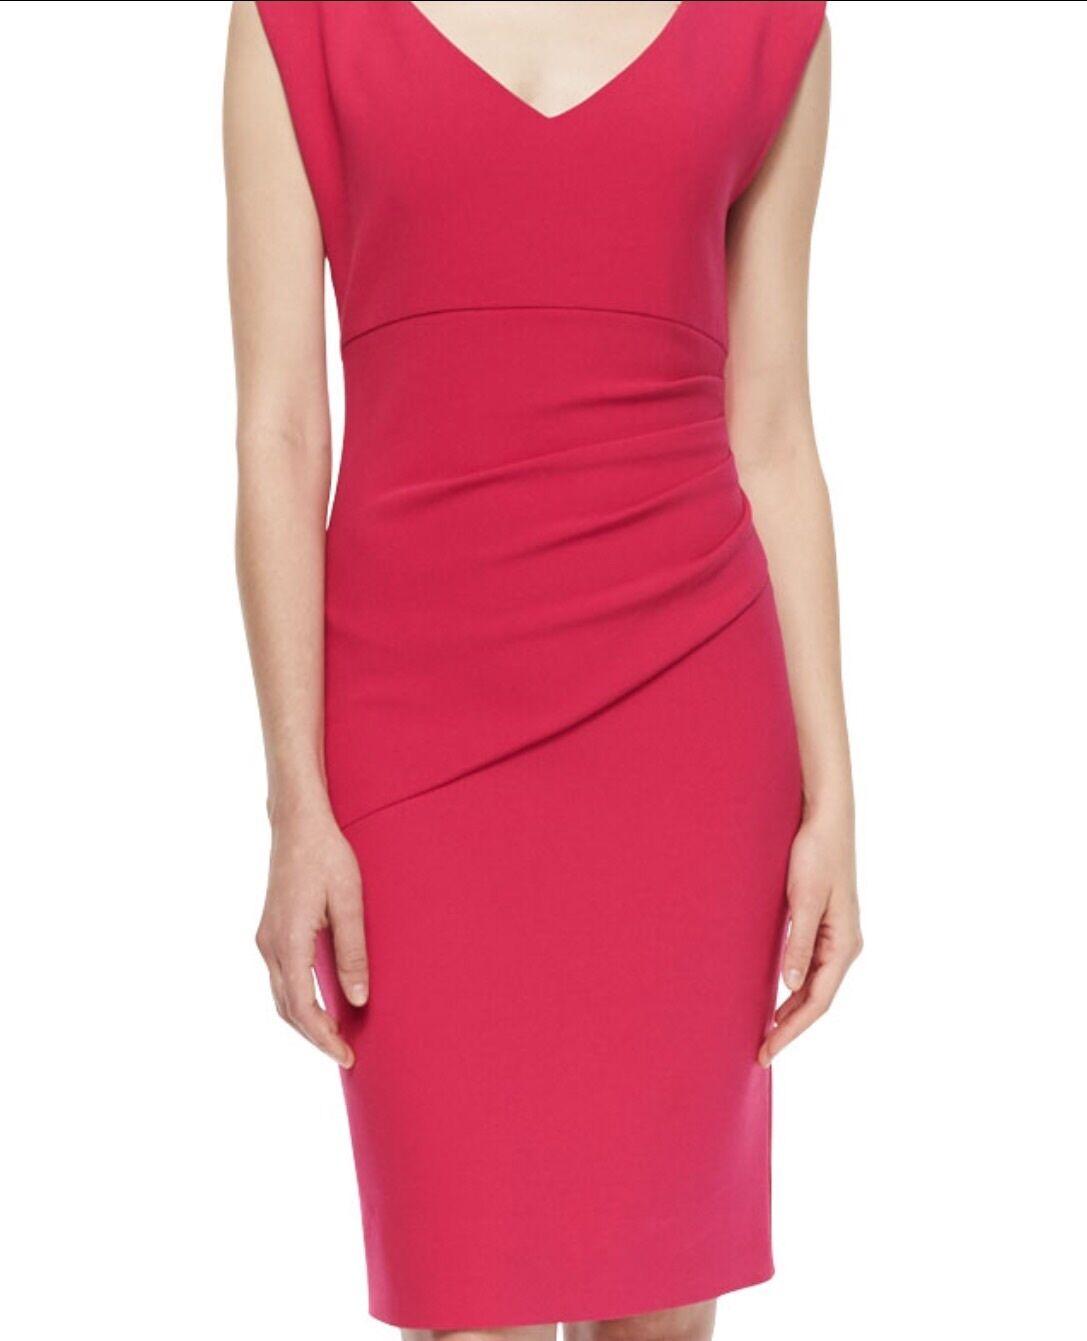 Nanette Lepore Dress Side Ruched Wrap Front Plunge Neck 4 rot Knee Length